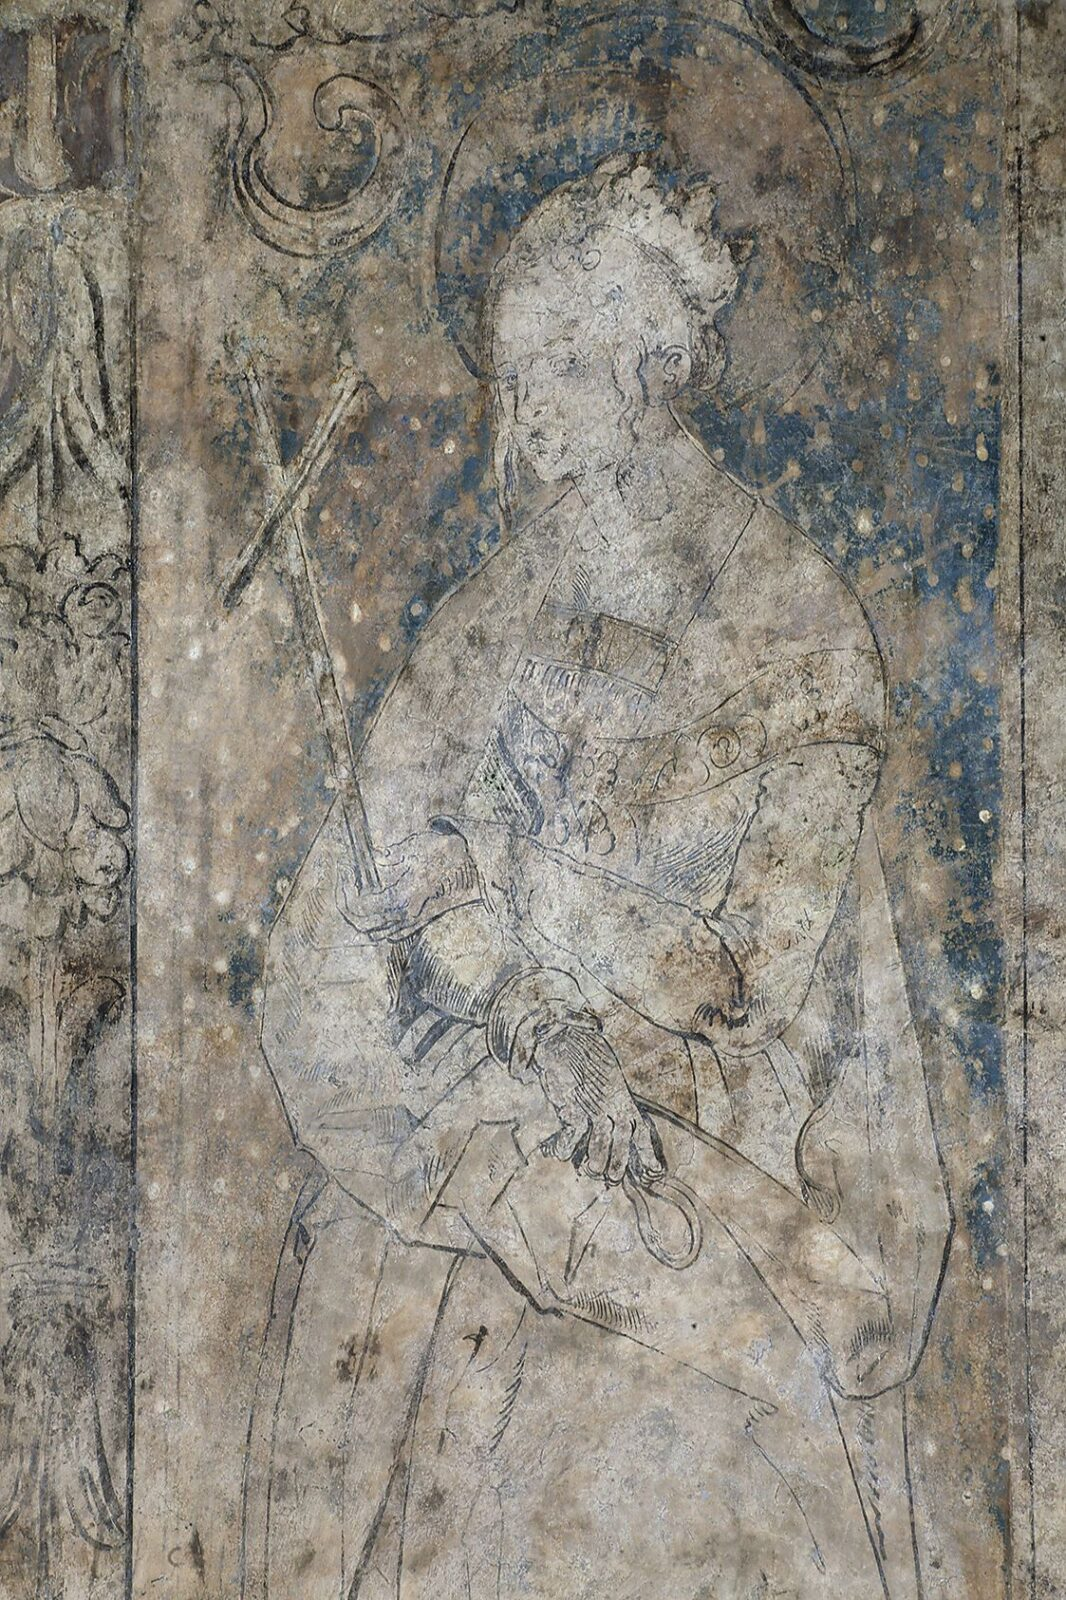 Durer's unknown painting was allegedly found in a church souvenir shop